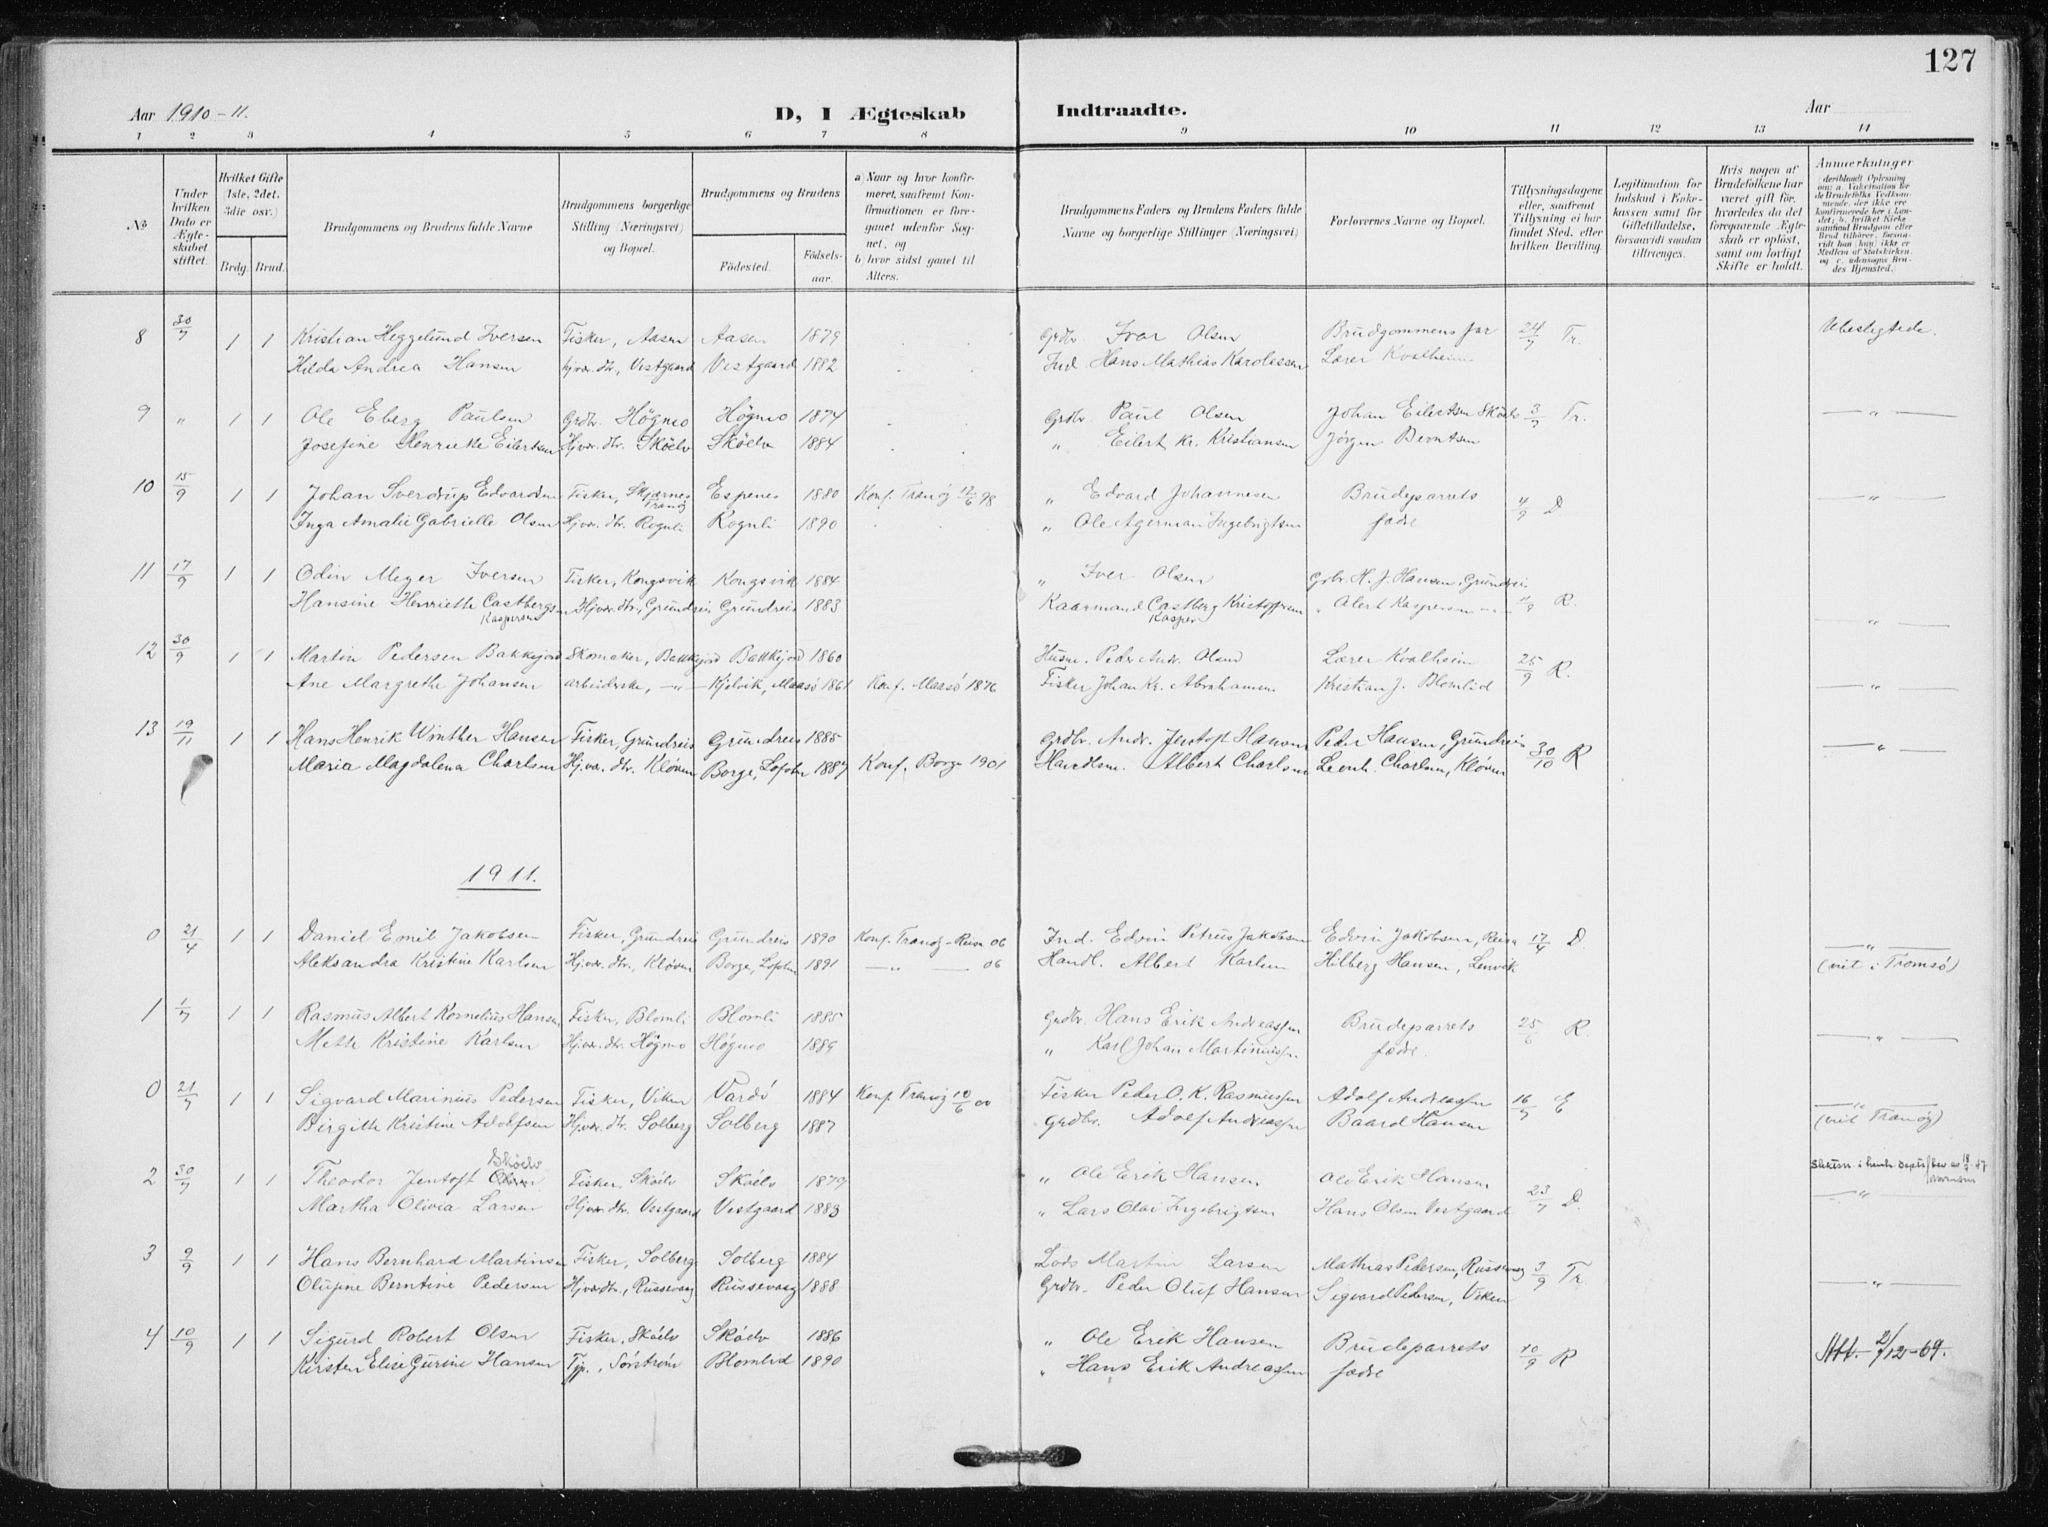 SATØ, Tranøy sokneprestkontor, I/Ia/Iaa/L0012kirke: Ministerialbok nr. 12, 1905-1918, s. 127